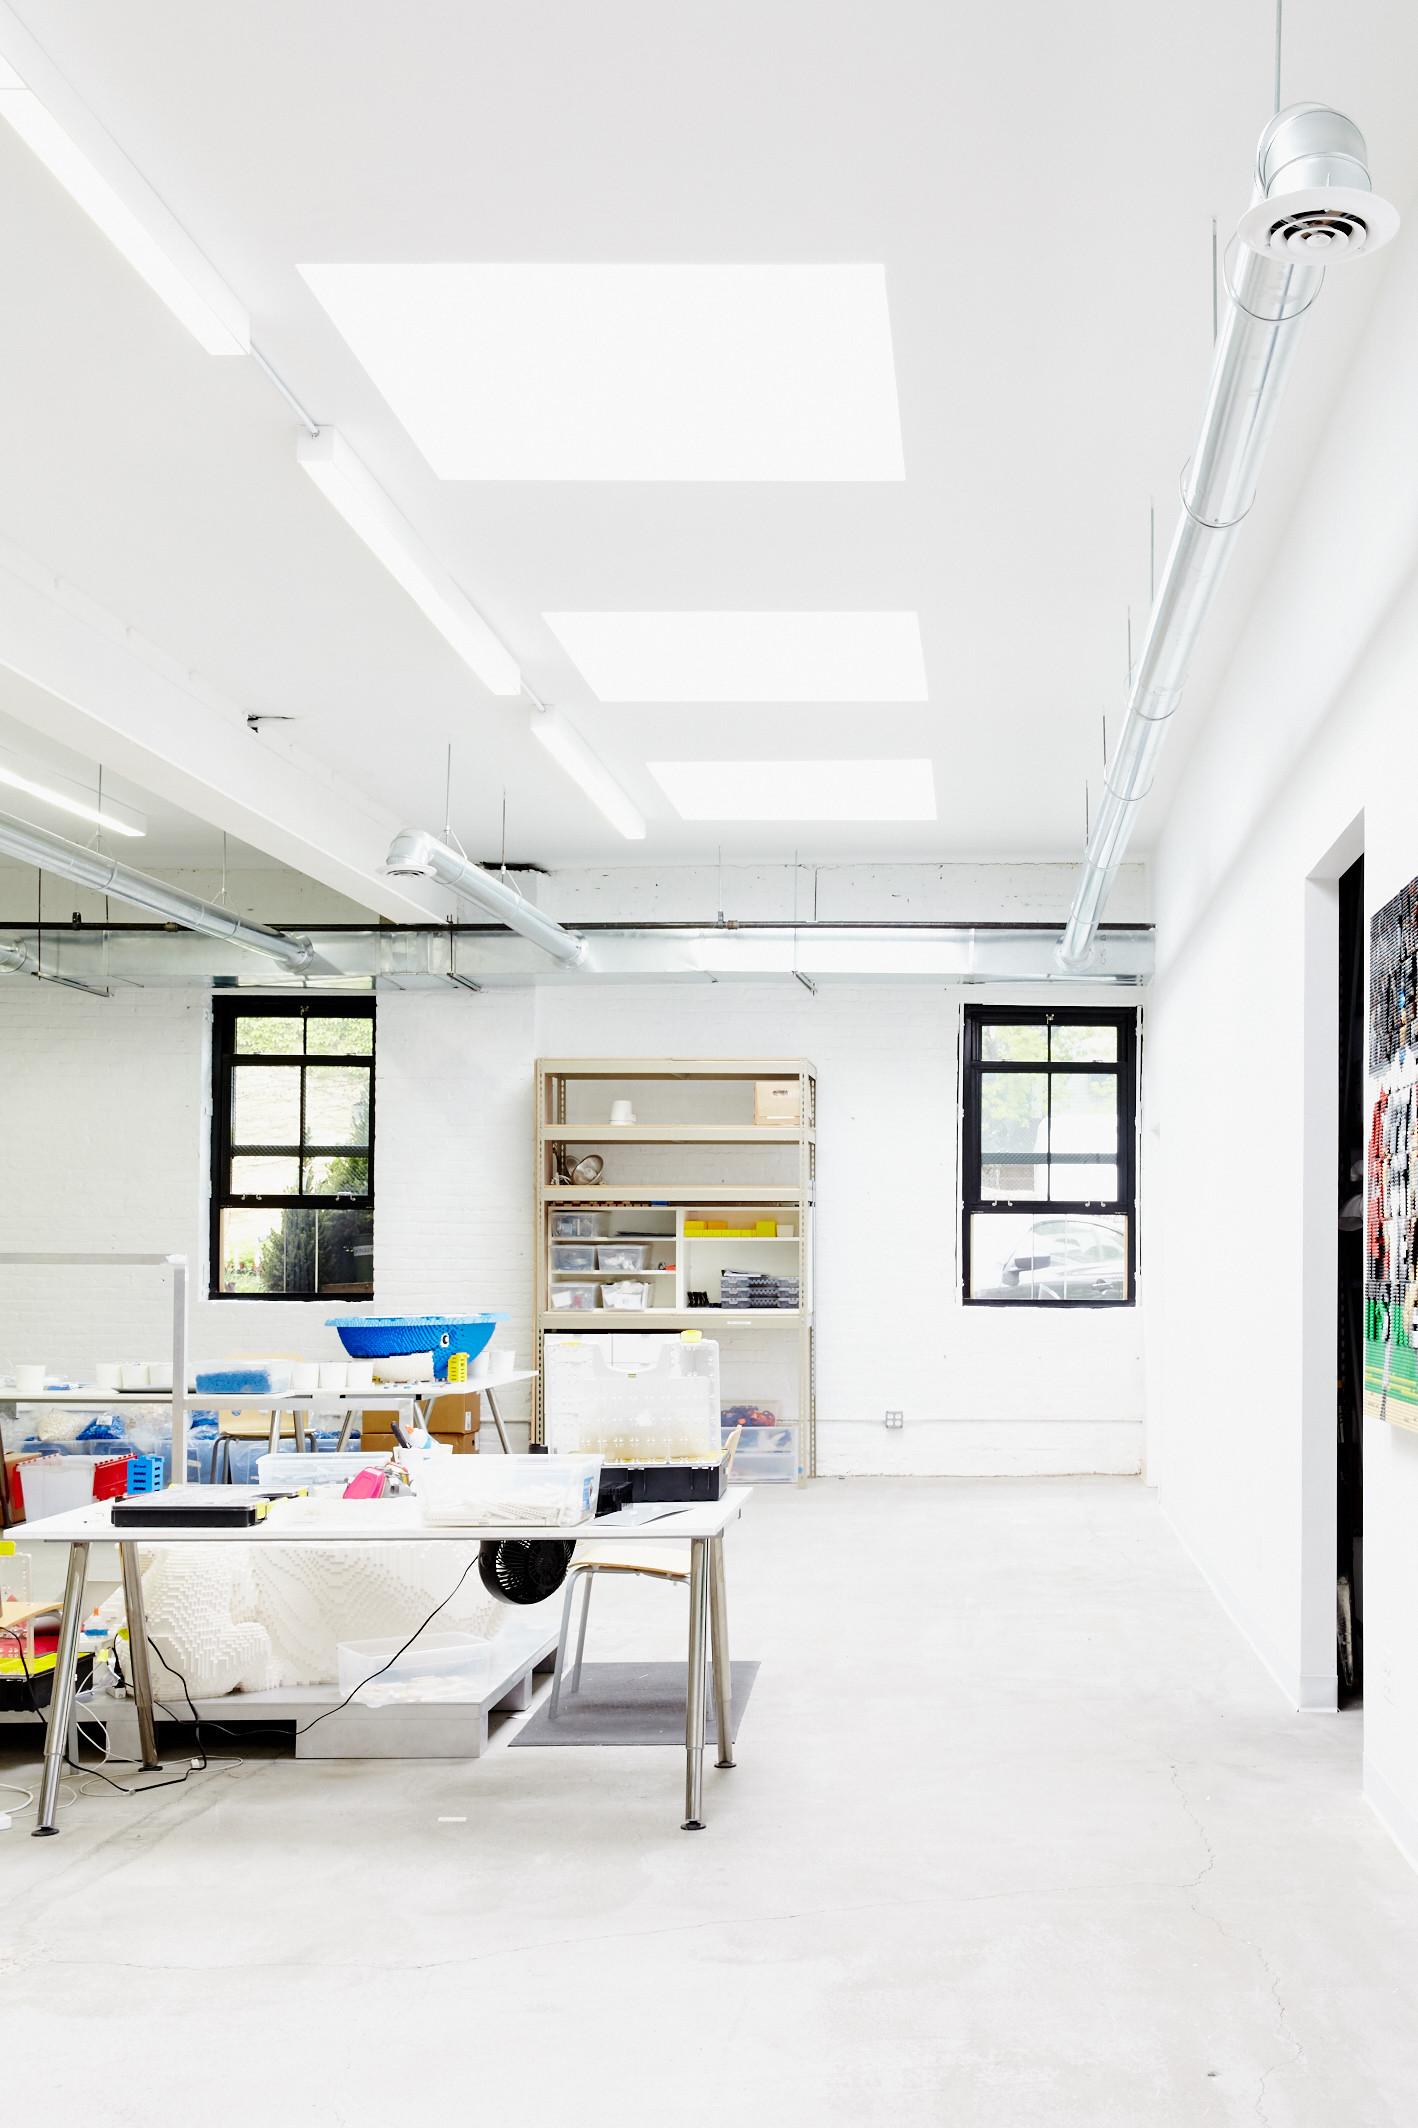 Gallery of Inside studioMET's Studio for LEGO Artist Sean